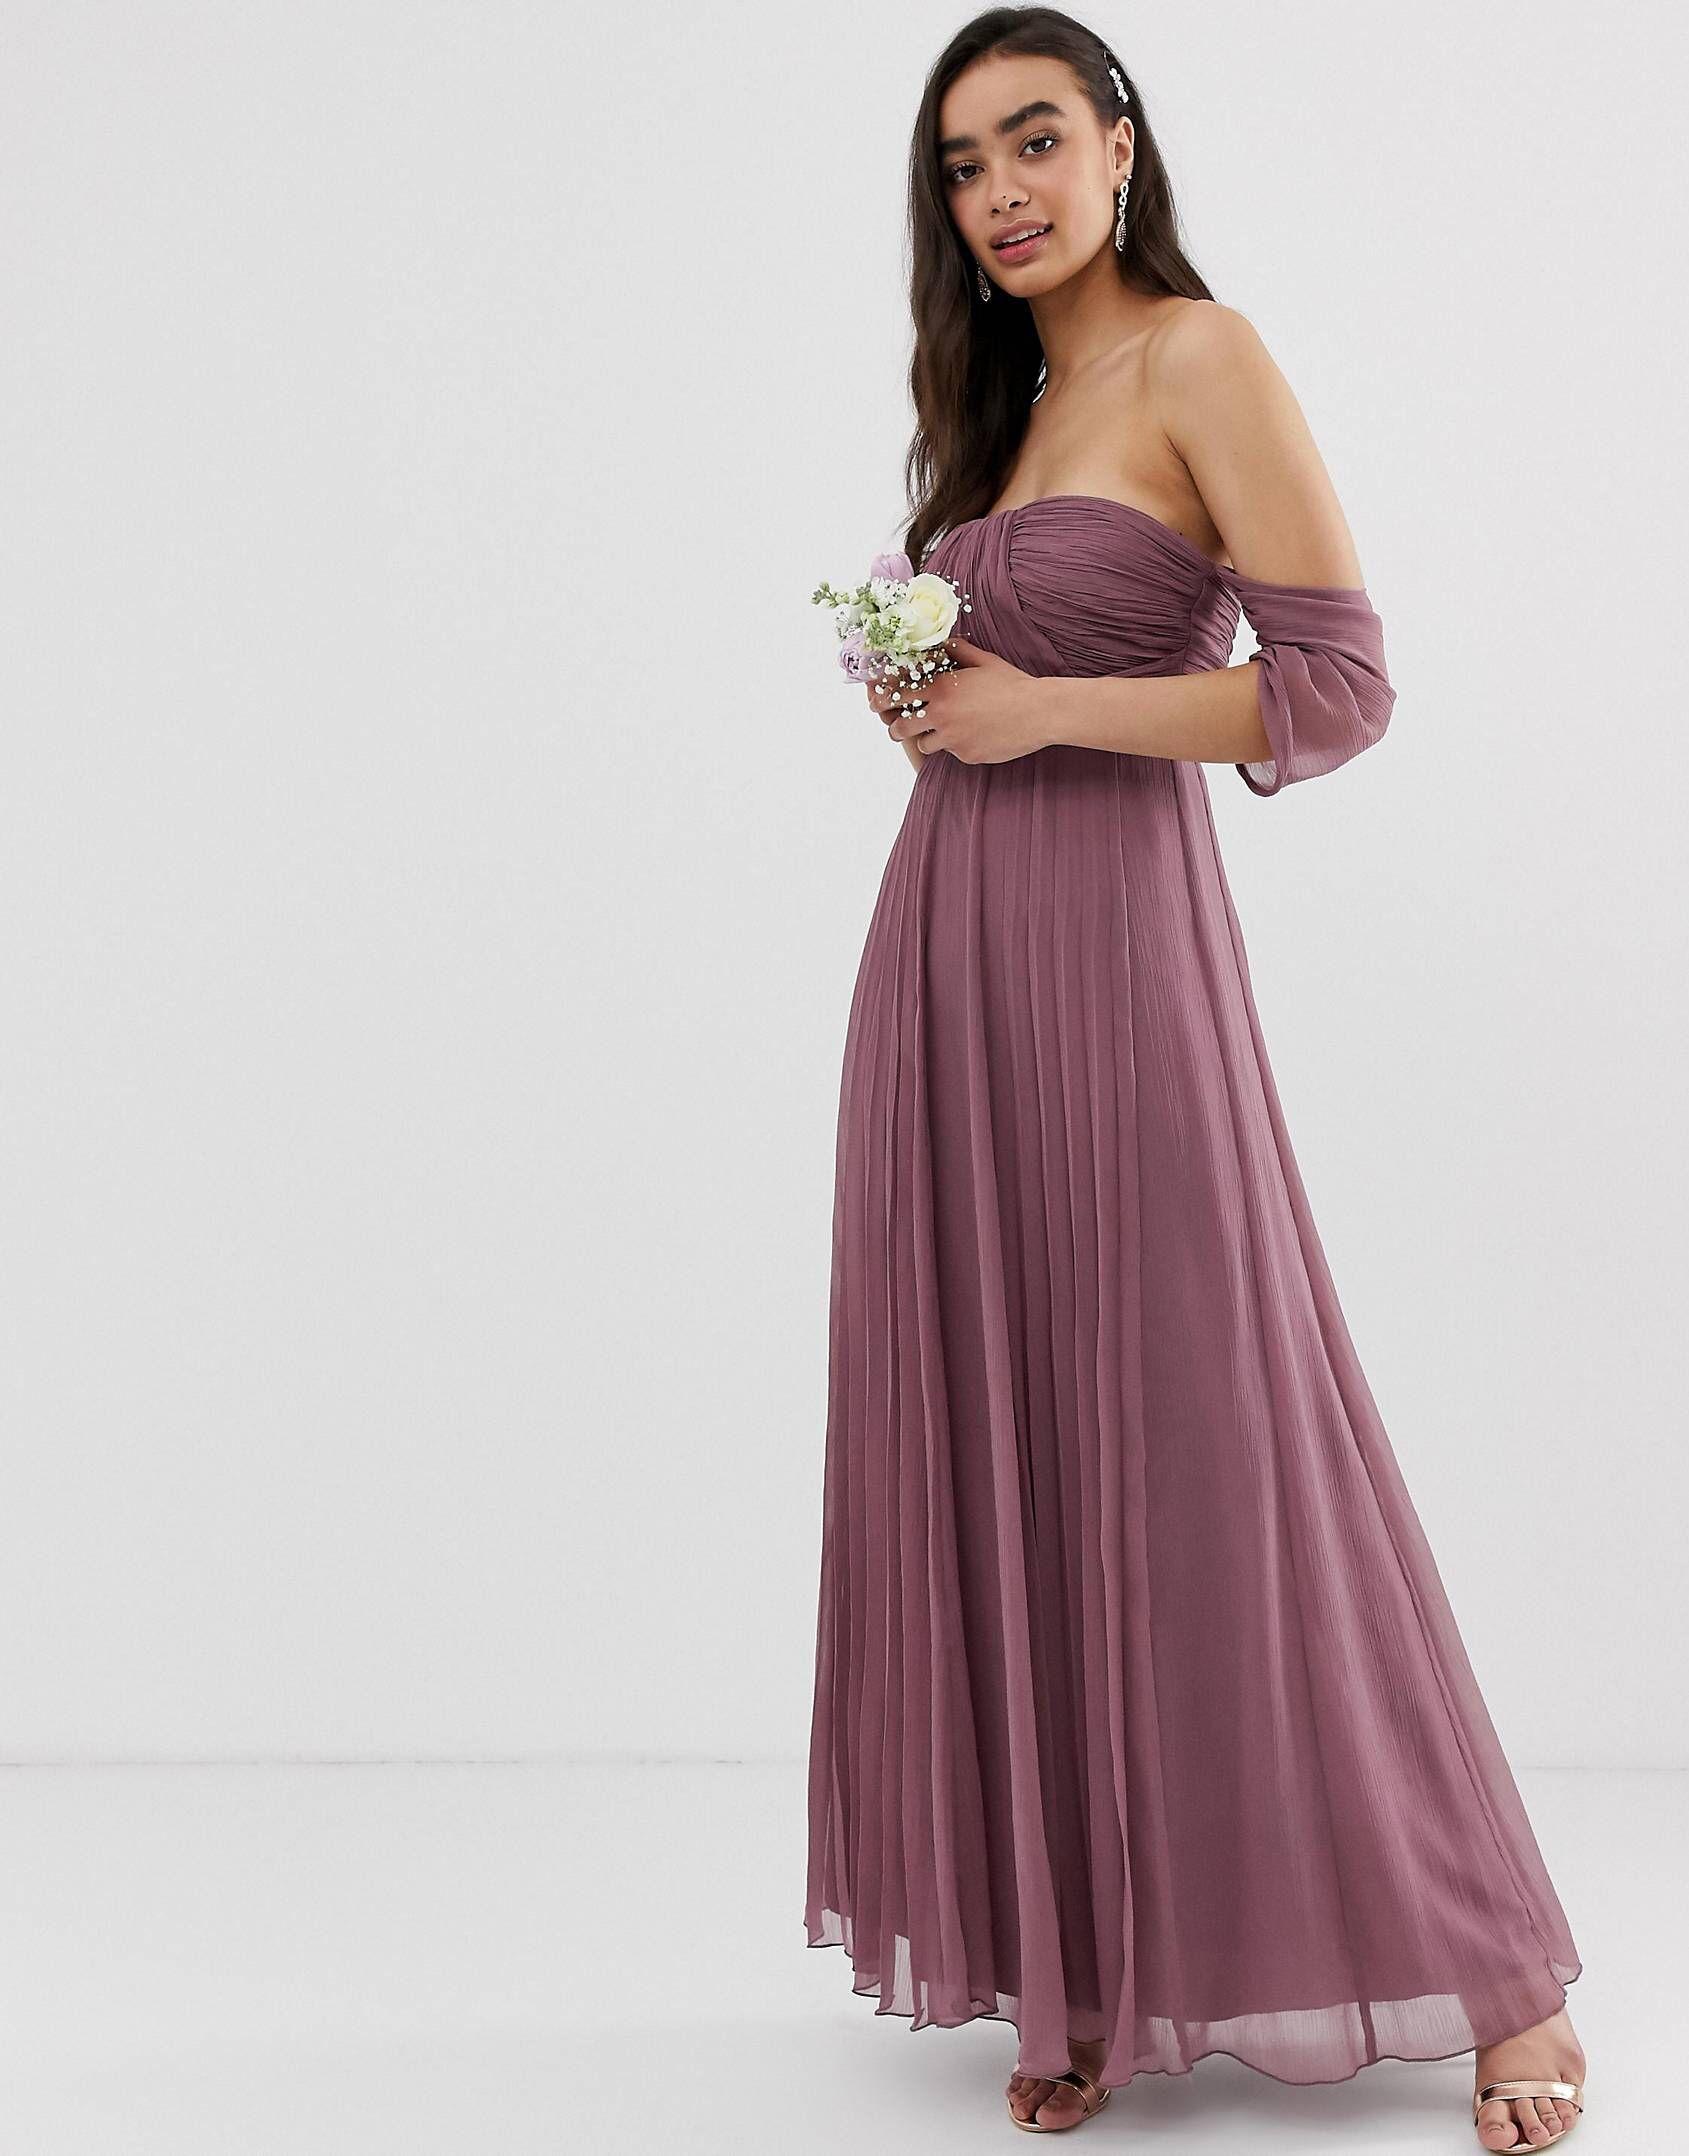 11+ Coiffure avec longue robe inspiration